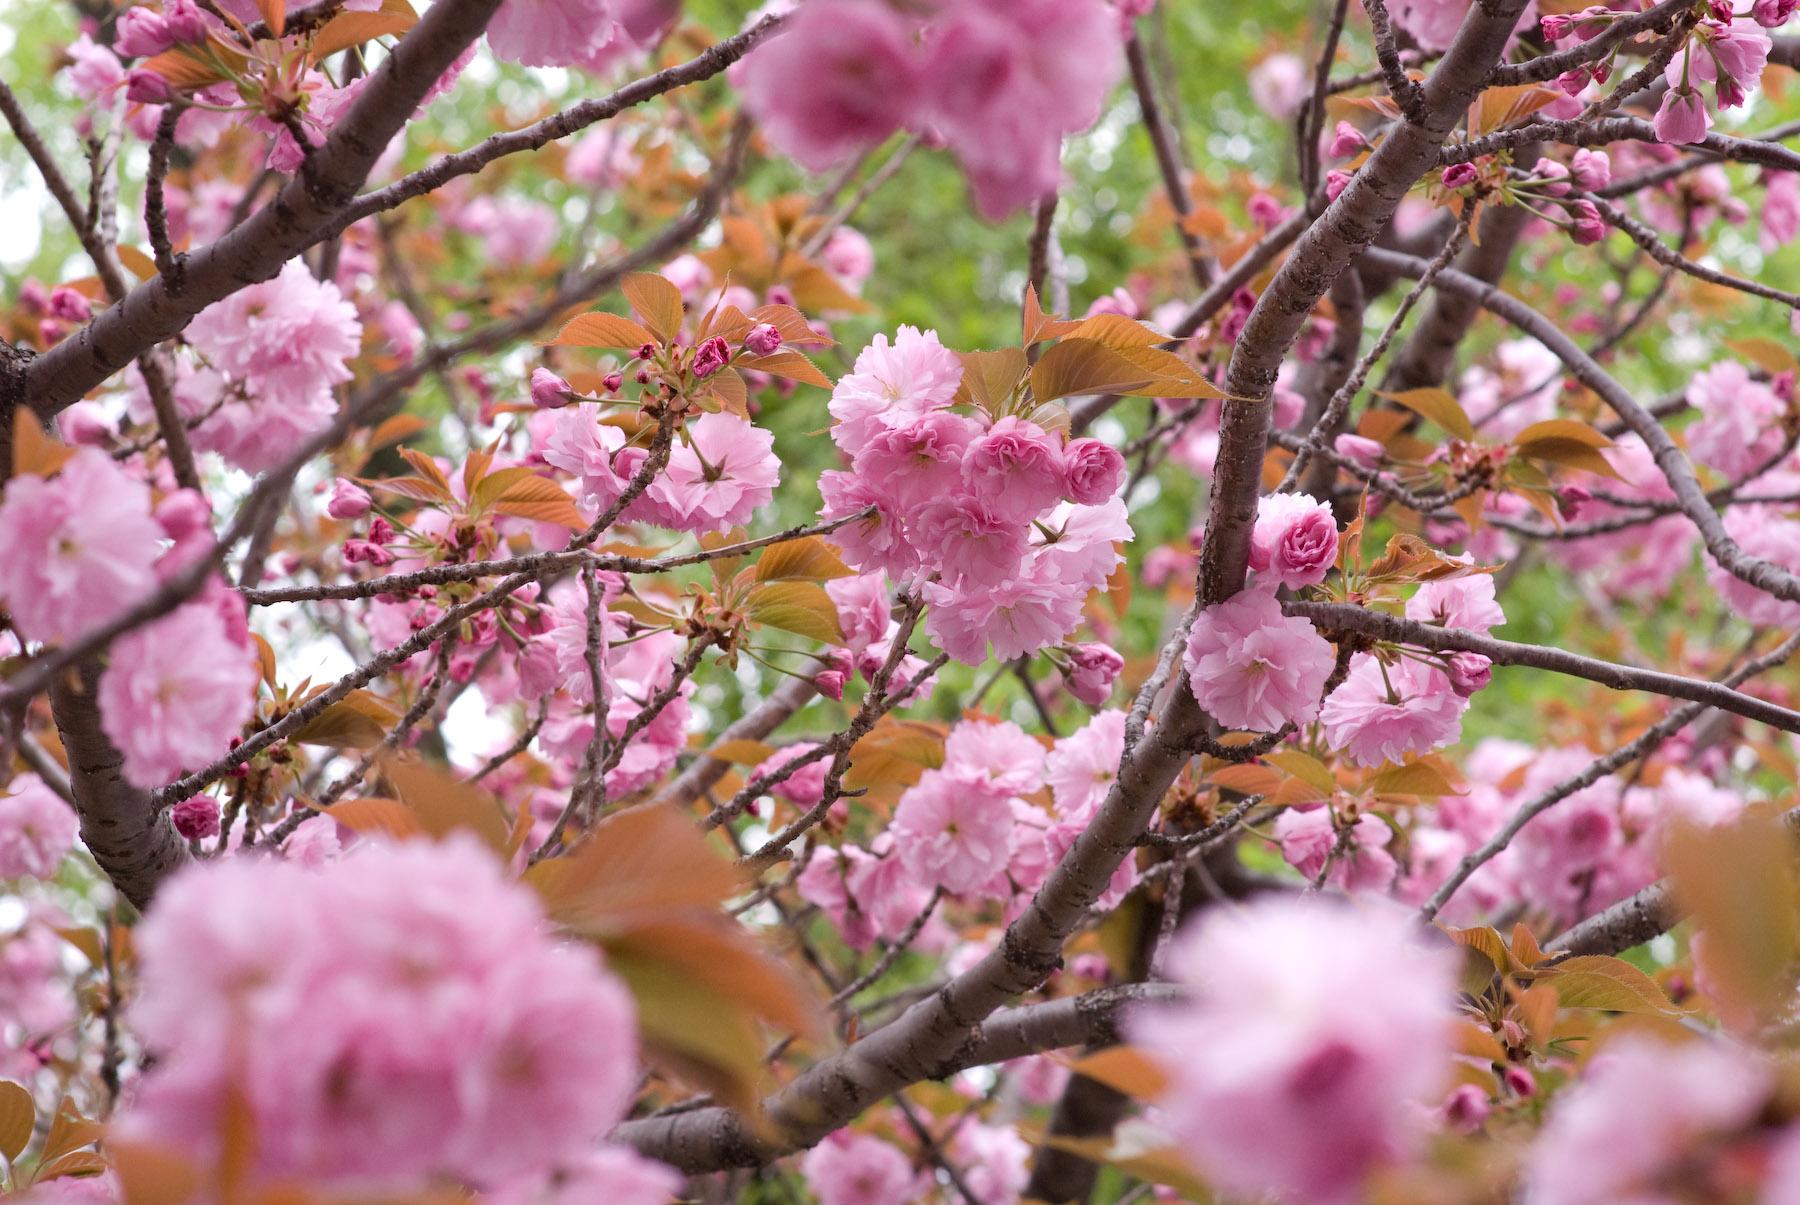 Jeffrey Friedl S Blog Fluffy Pink A Big Gray Bird And